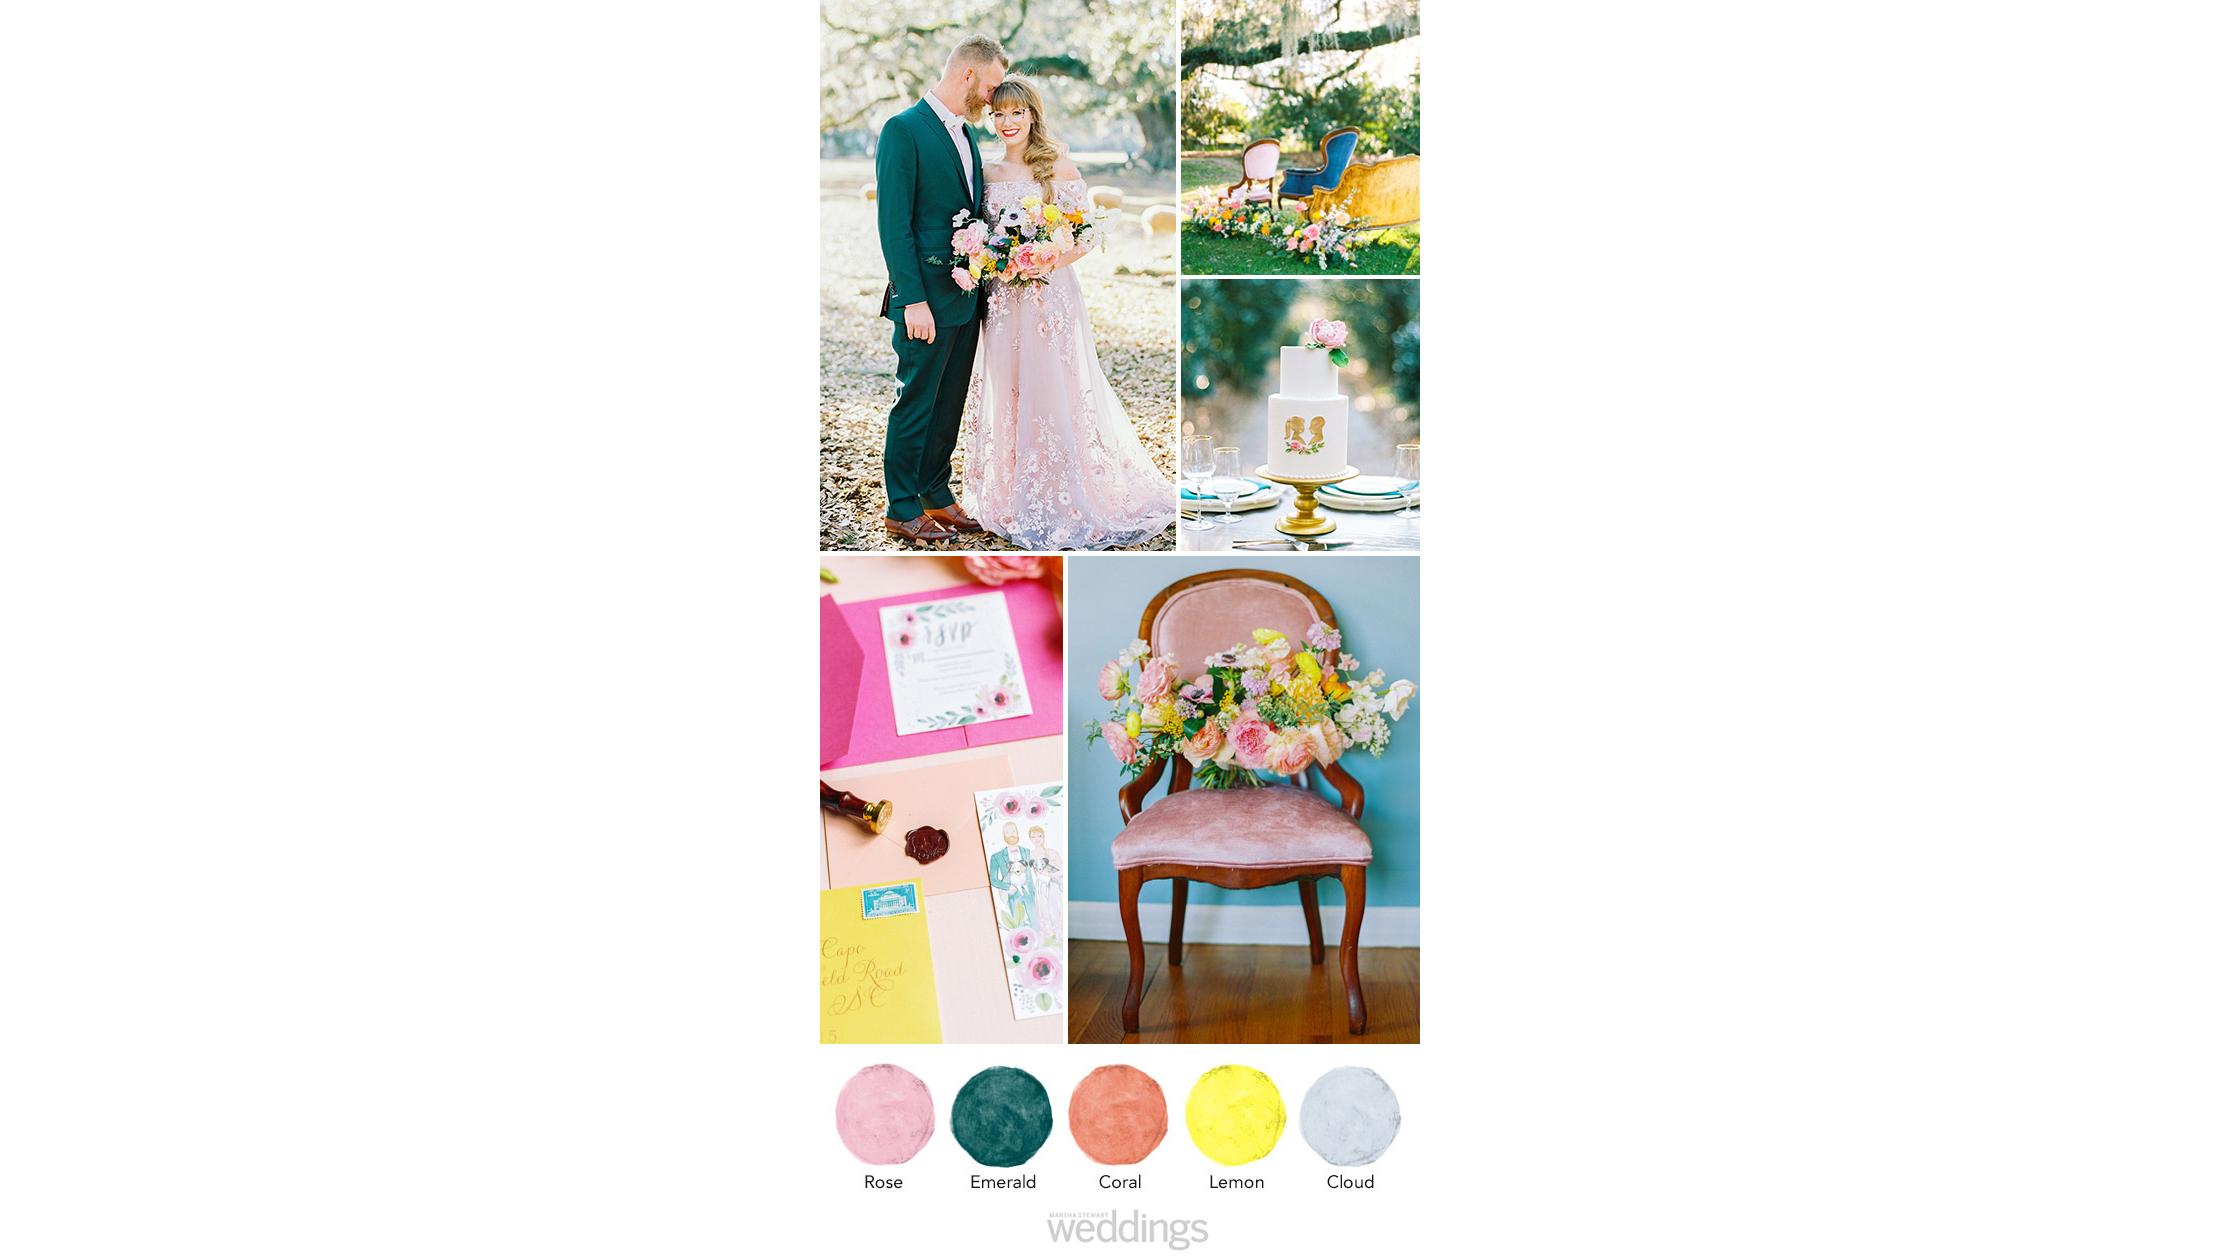 jewel tones wedding color palette ideas